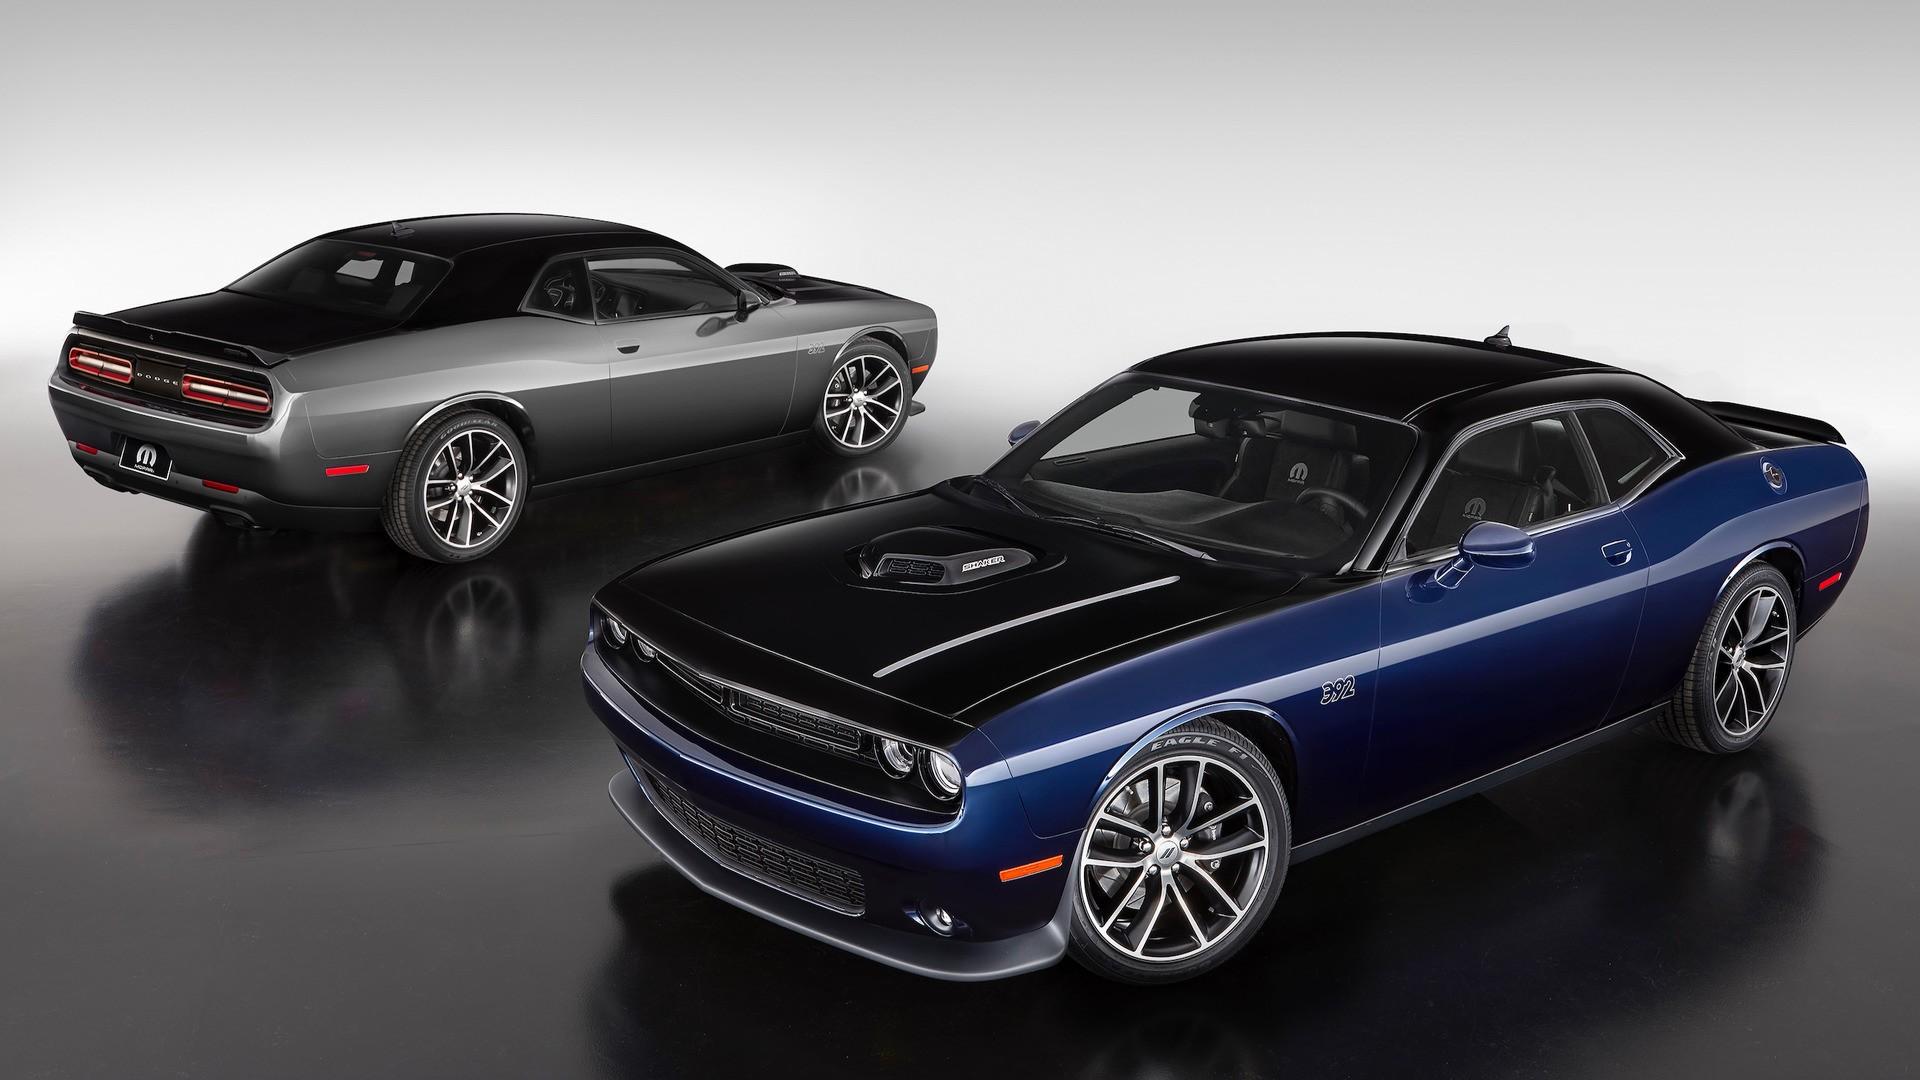 2015 Dodge Barracuda >> 2017 Dodge Challenger Gets Special Edition For Mopar Anniversary - autoevolution